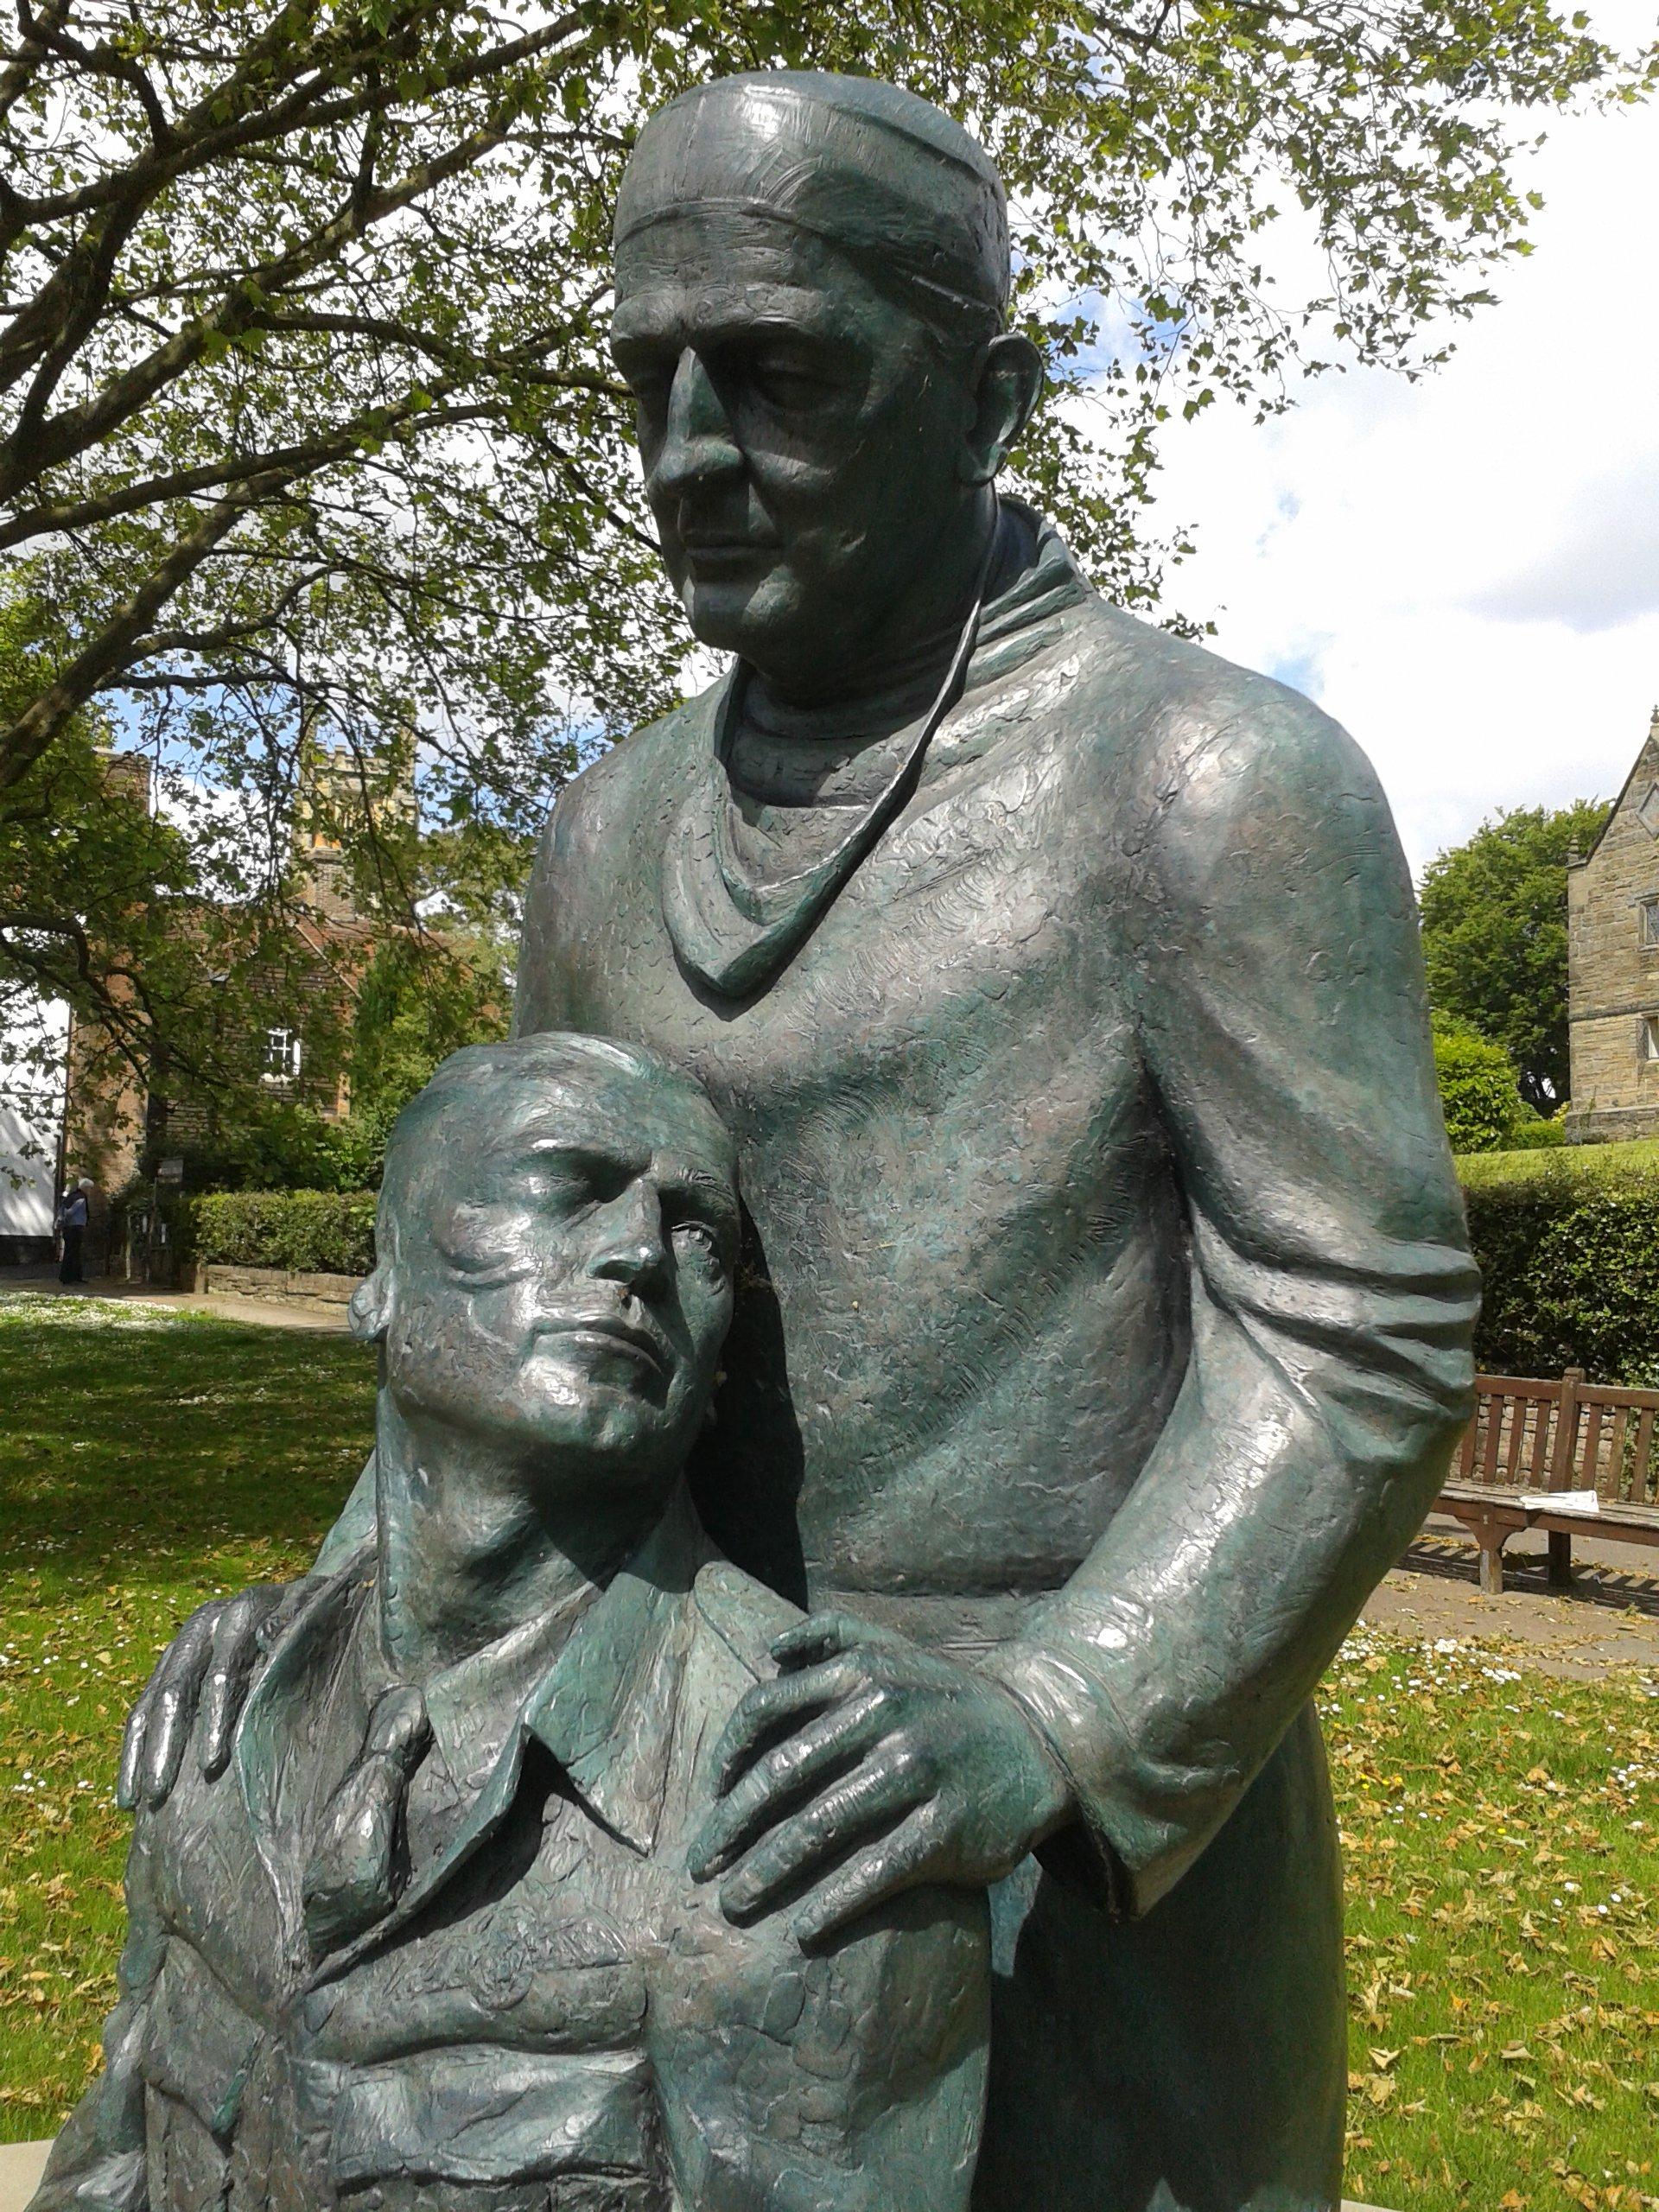 East Grinstead: Battle Of Britain Commemoration and McIndoe Statue Dedication